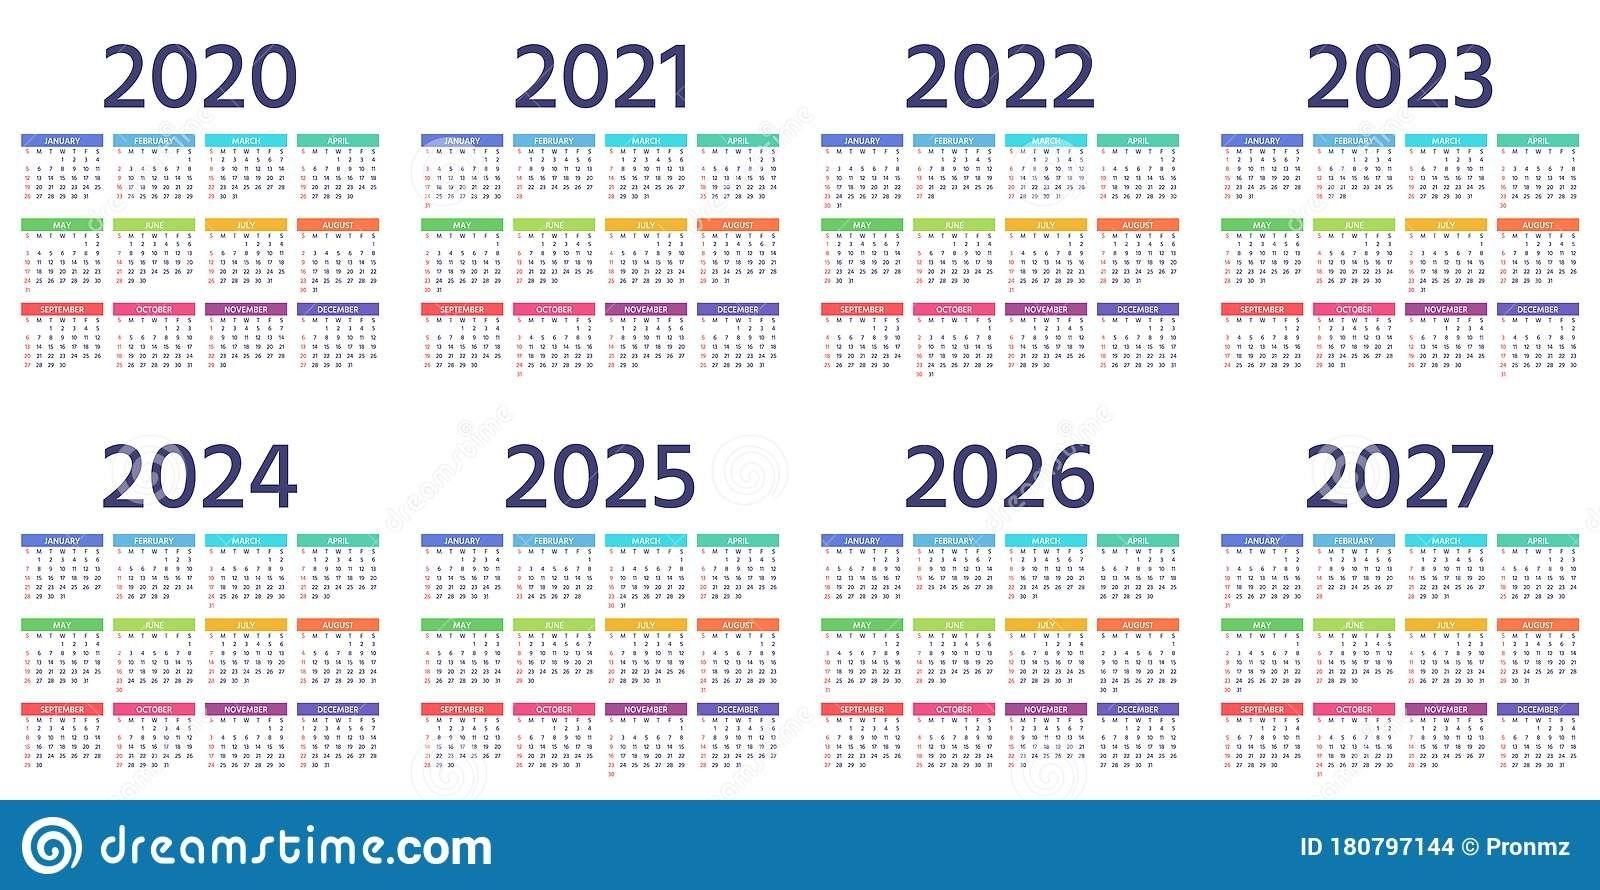 Calendar 2021 2022 2023 Years Vector Illustration Simple